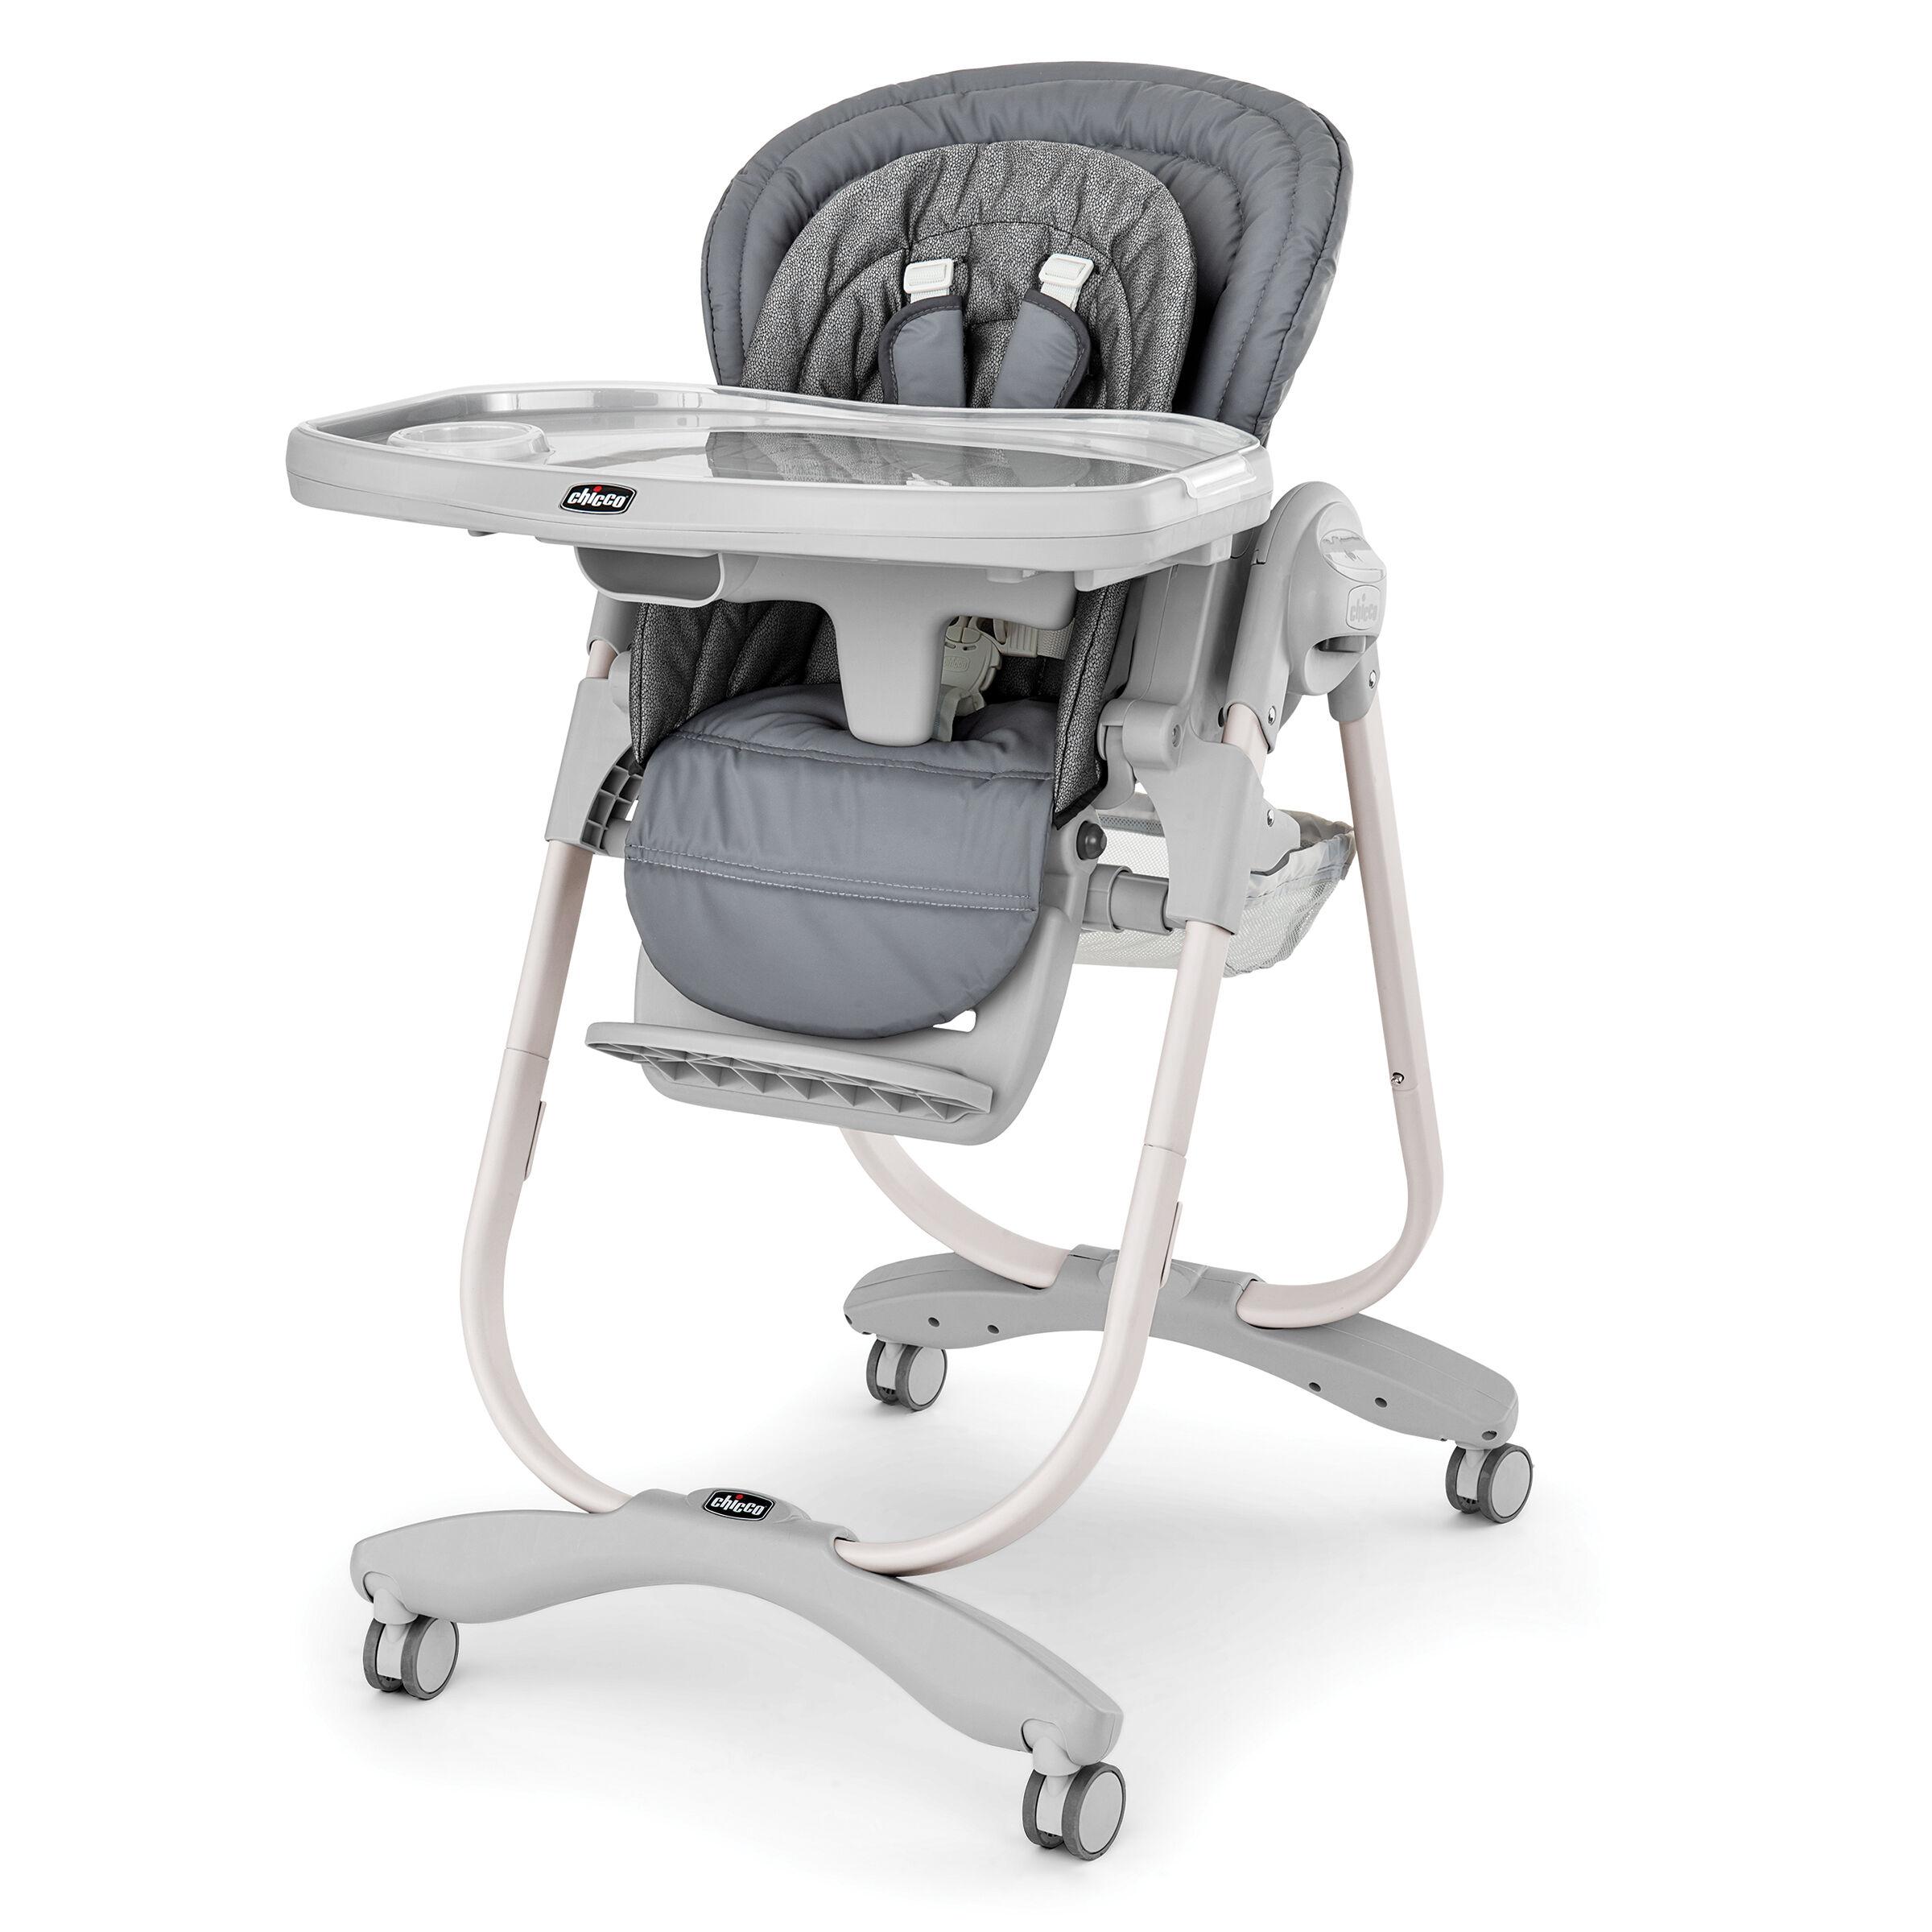 chicco polly high chair babies r us hydraulic accessories magic highchair avena